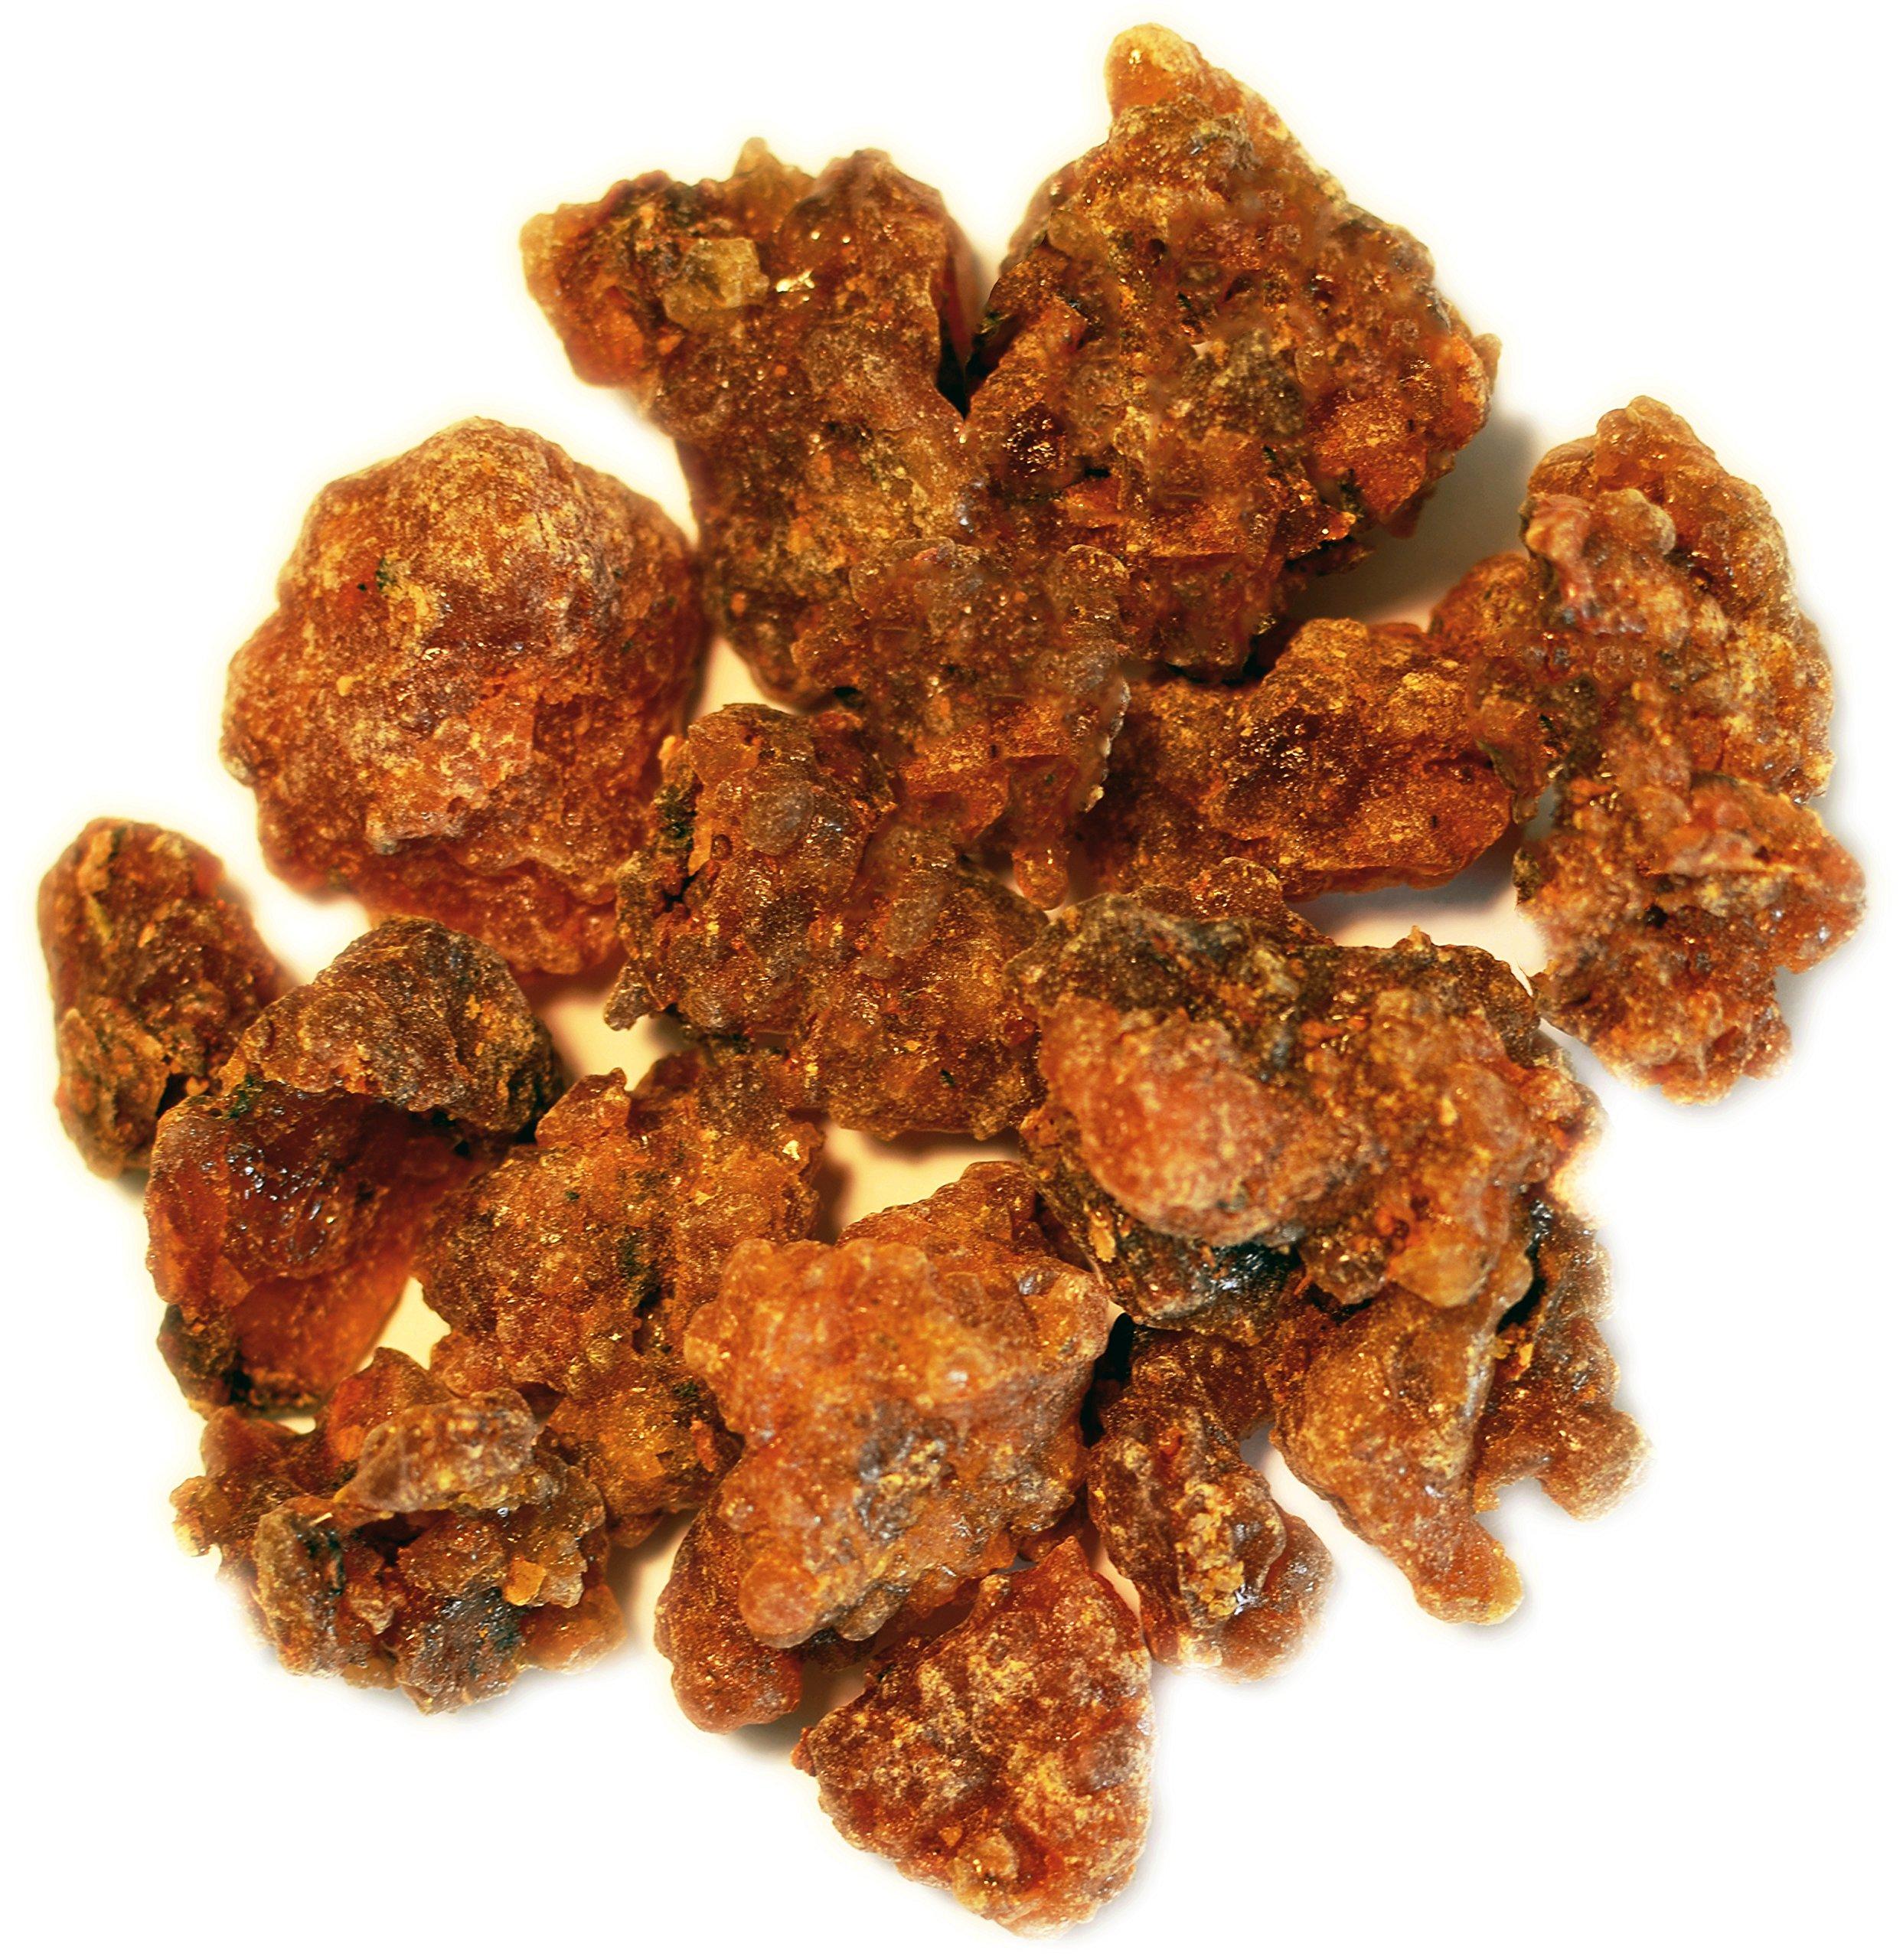 EarthWise Myrrh Resin - Organic - 1/2 lb - by Aromatics